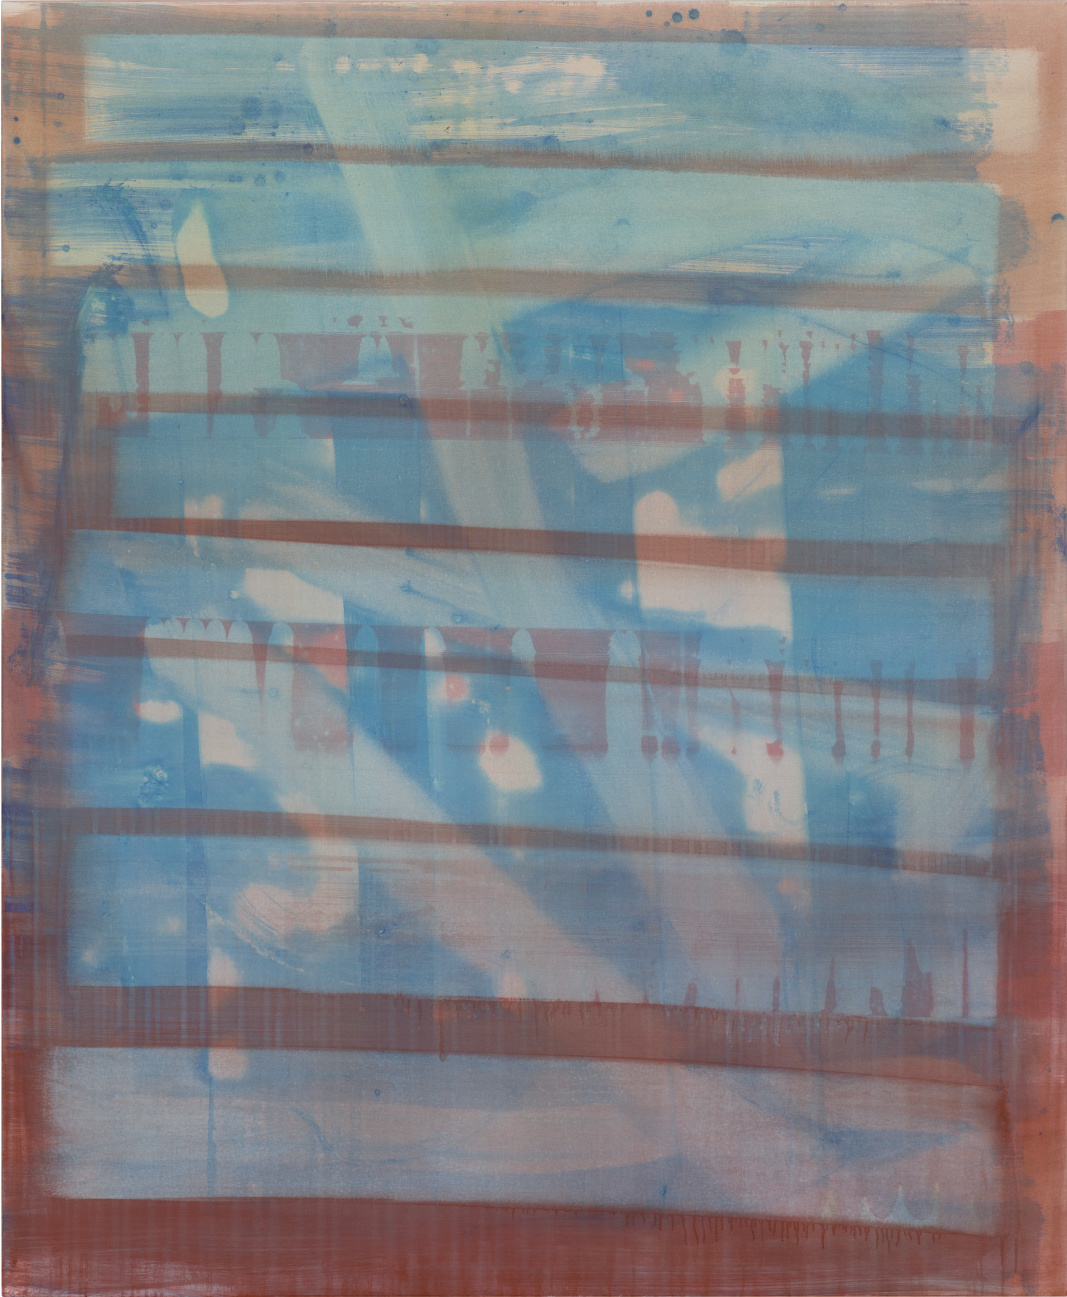 Ohne Titel [17203] | 2017 | Organic Preparation of Pigments on Canvas | 175 x 145 cm | ©Felix Büchel, Courtesy GALERIE ALBER